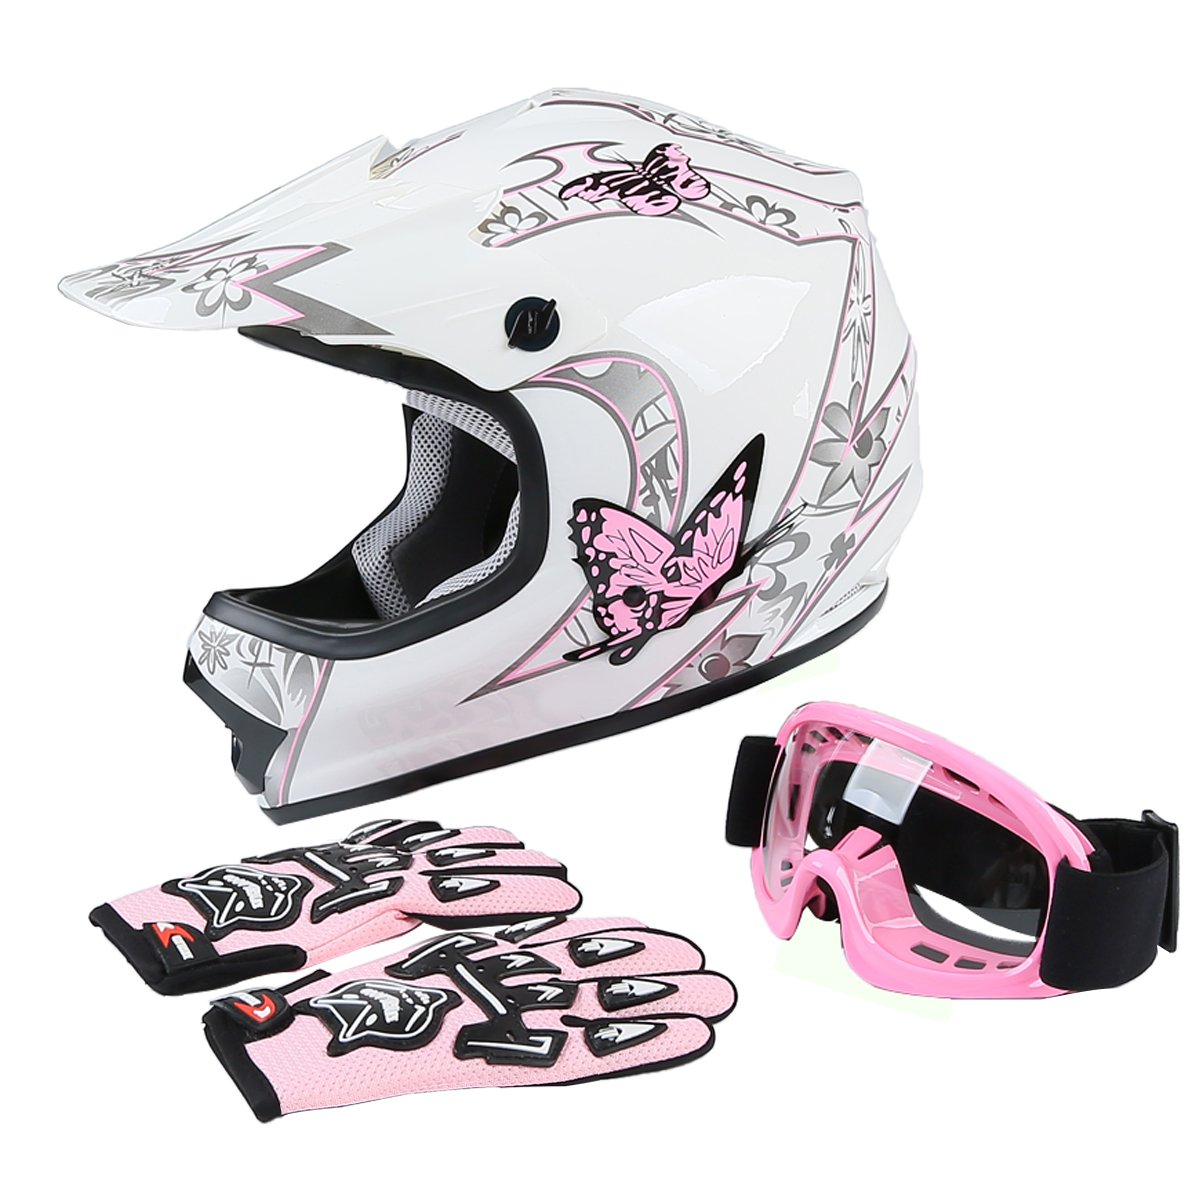 Tengchang Youth Kids Motocross Offroad Street Dirt Bike Helmet Goggles Gloves Atv Mx Helmet Pink Butterfly